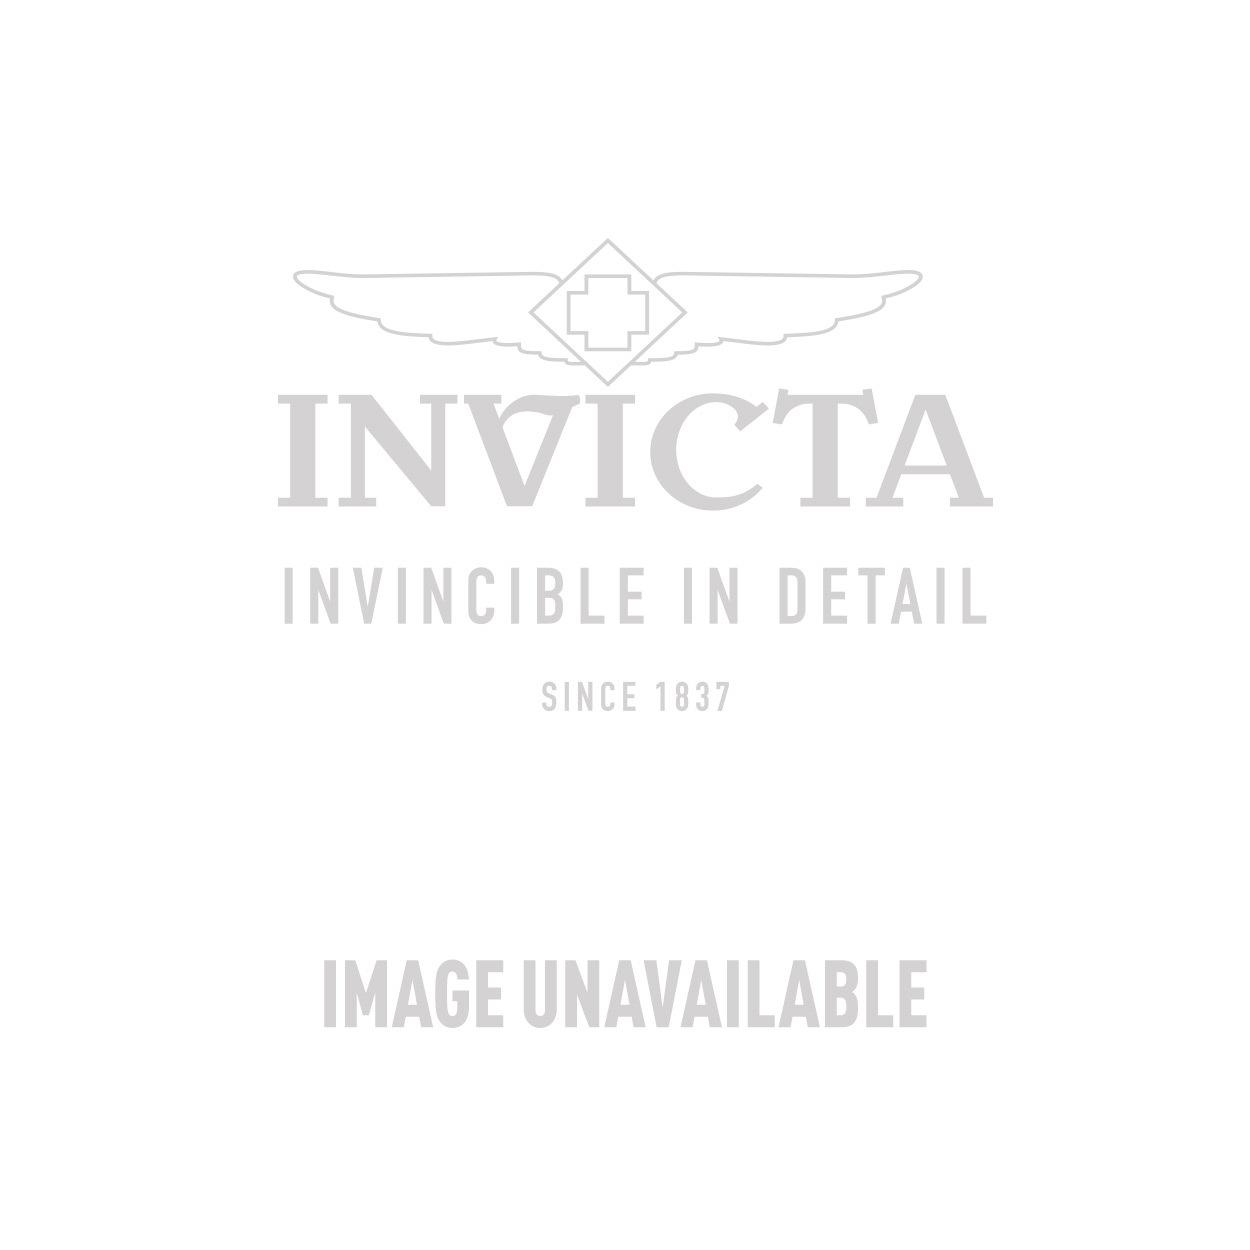 Invicta Corduba Swiss Movement Quartz Watch - Rose Gold case with Blue tone Polyurethane band - Model 10505